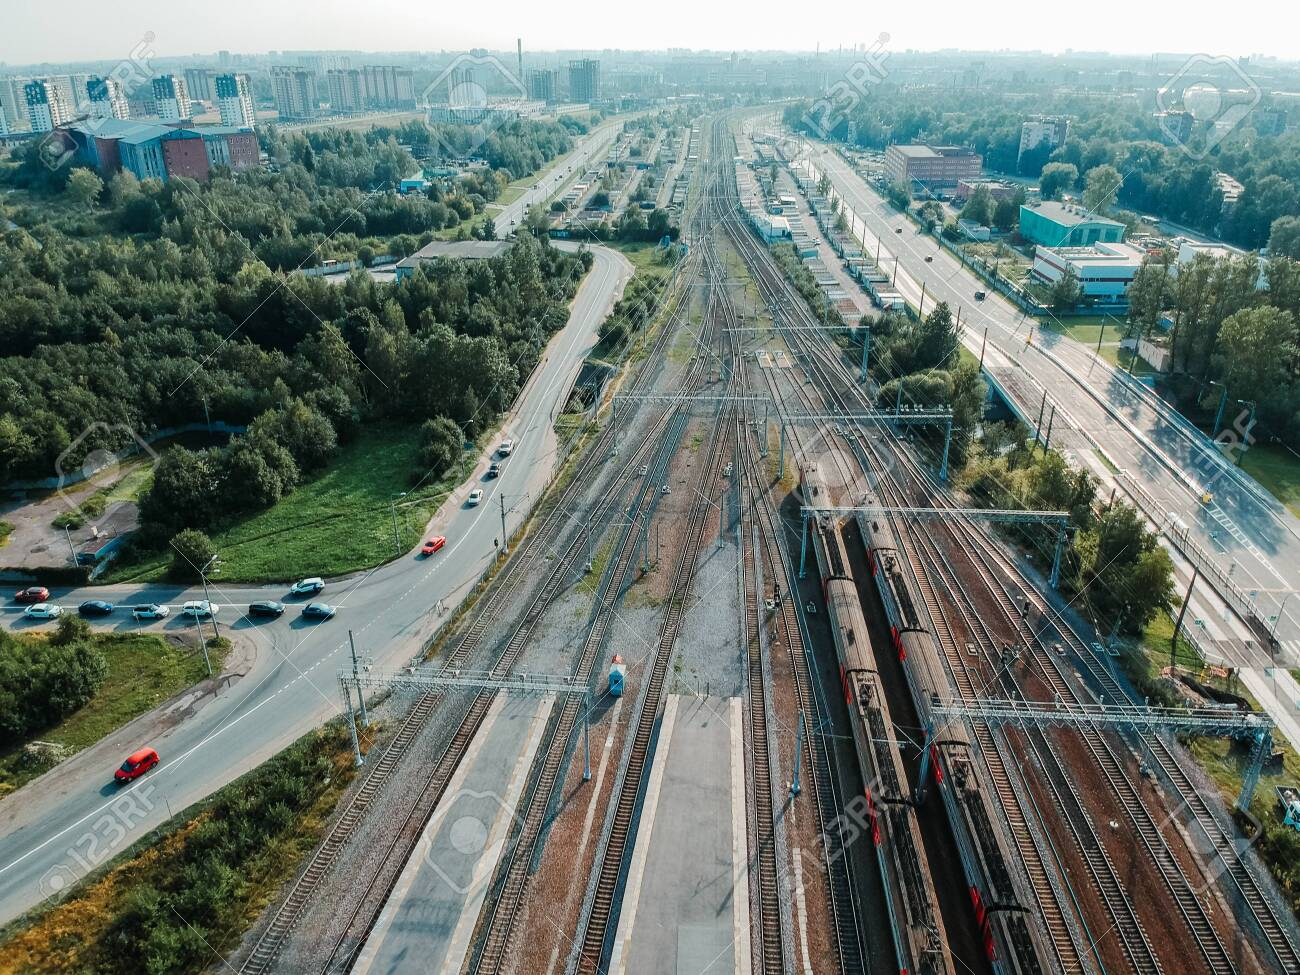 Aerialphoto train depots, rail tracks, interchanges and trains. St. Petersburg, Russia. - 138775010